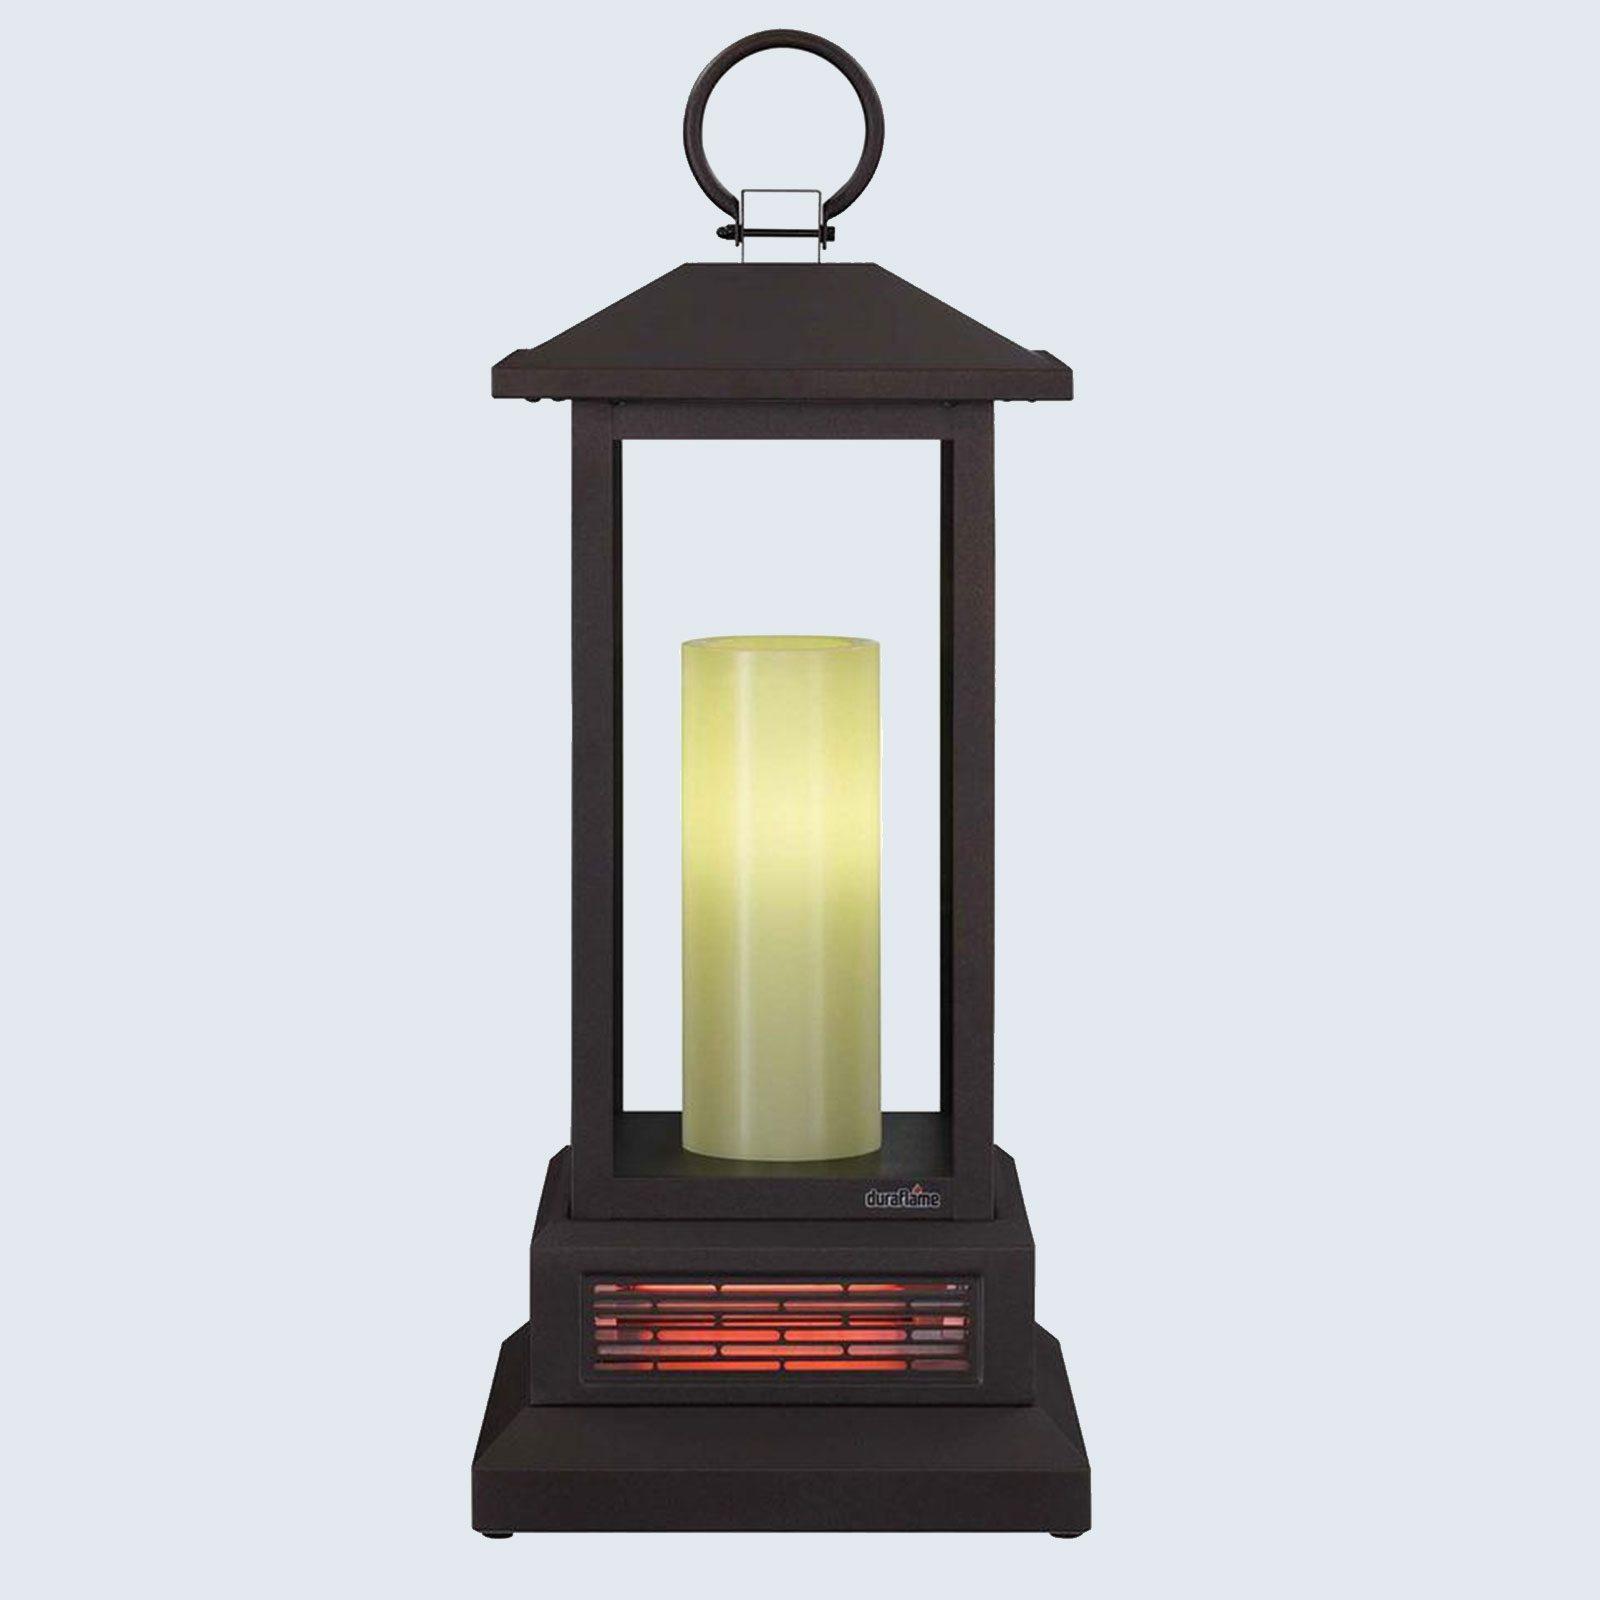 Duraflame Electric Lantern Space Heater